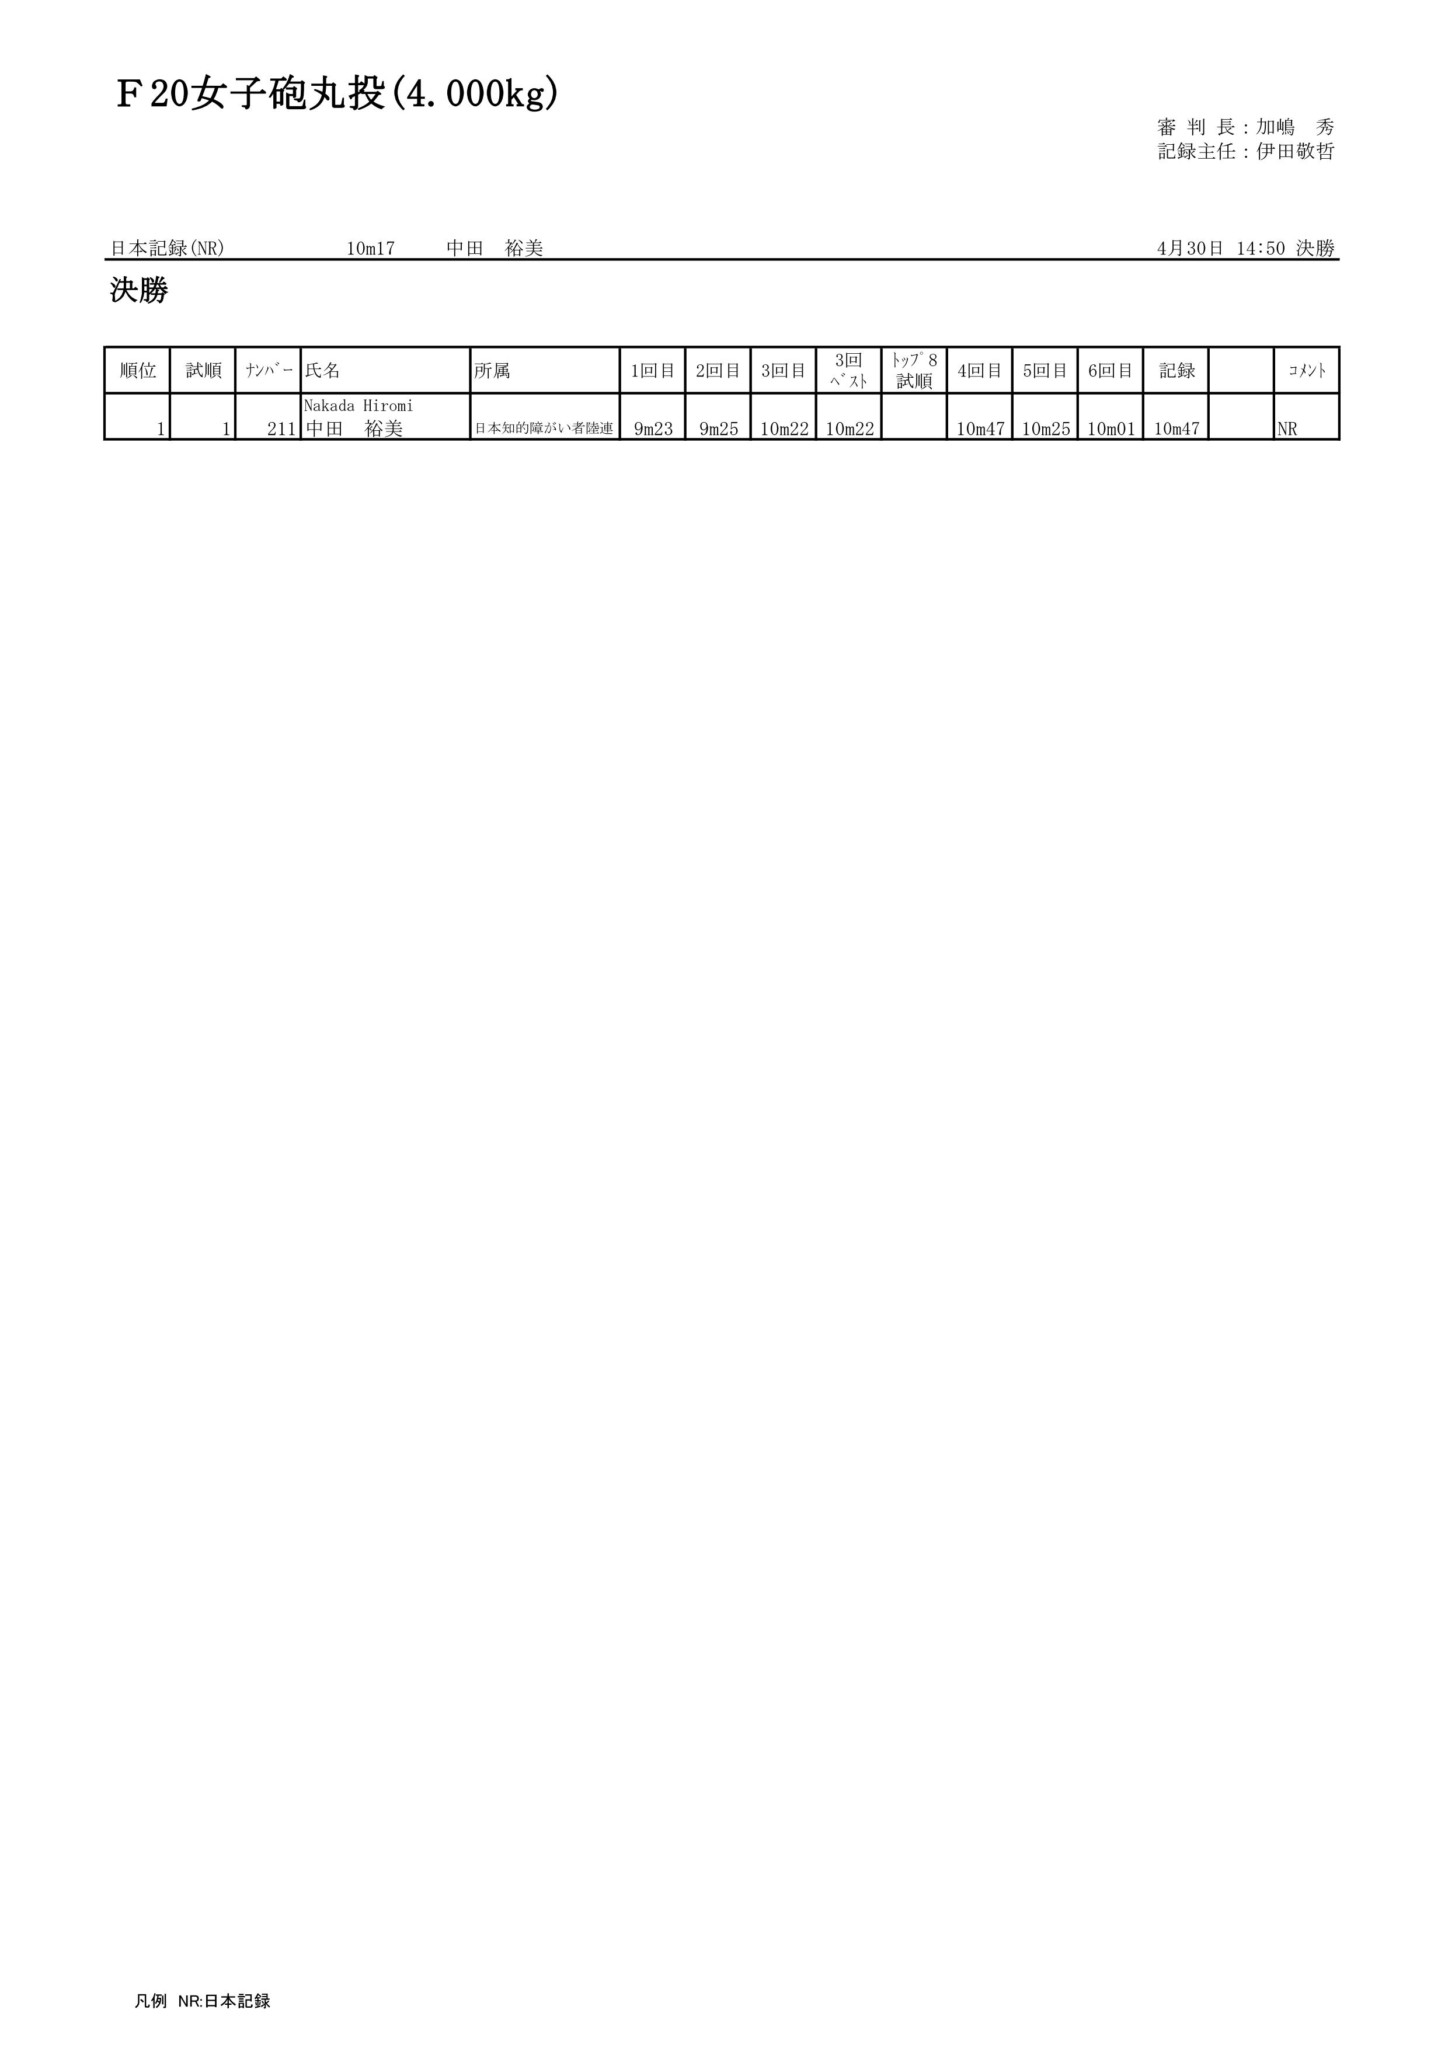 106F20女子砲丸投(4.000kg)_01